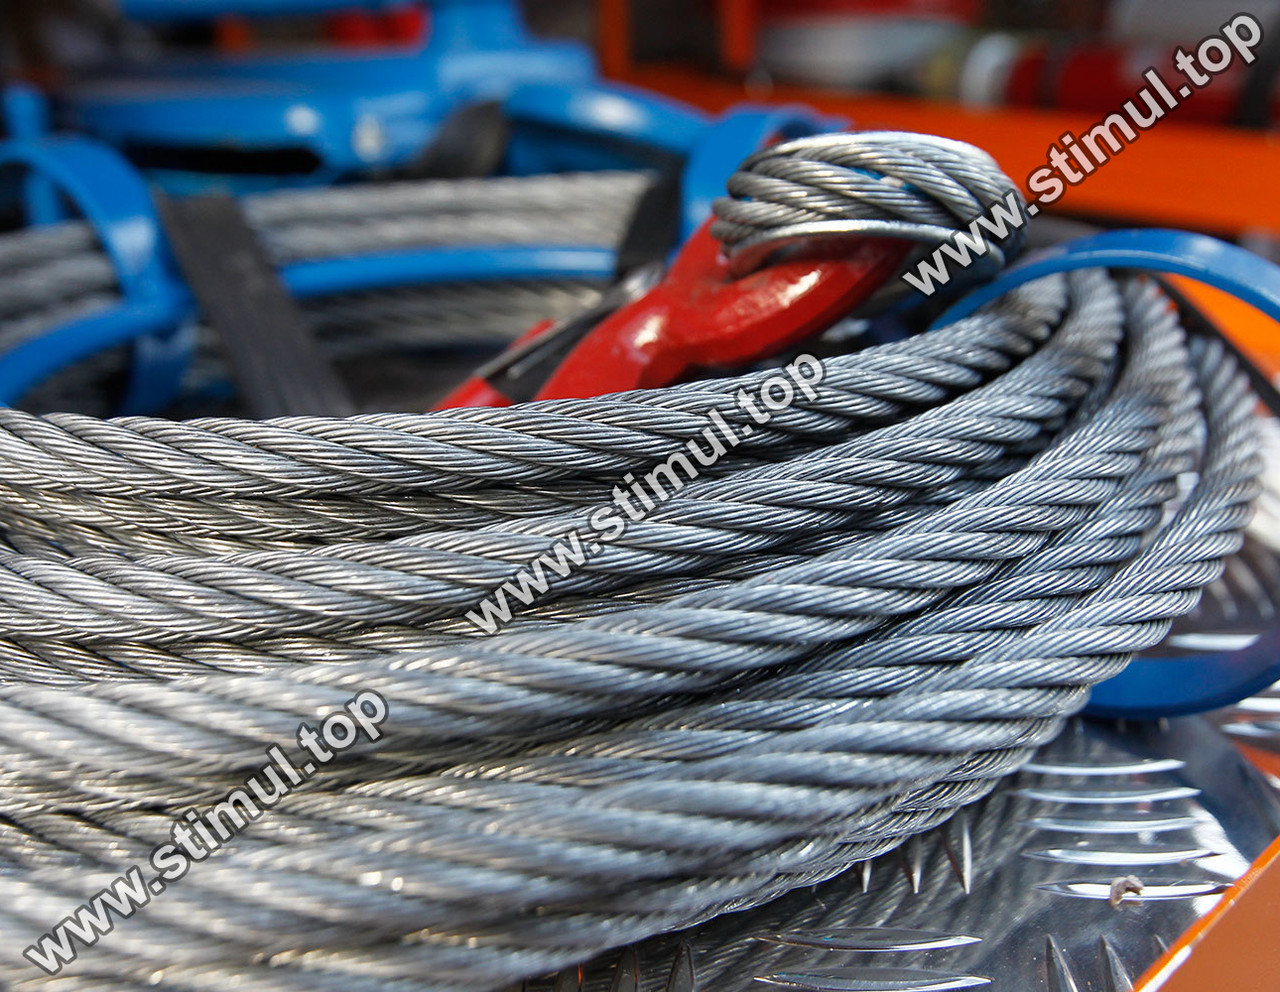 Трос оцинкованный Ø 6 мм (ISO 2408 / 6х12) | Сталеві канати оптом | Канат стальной